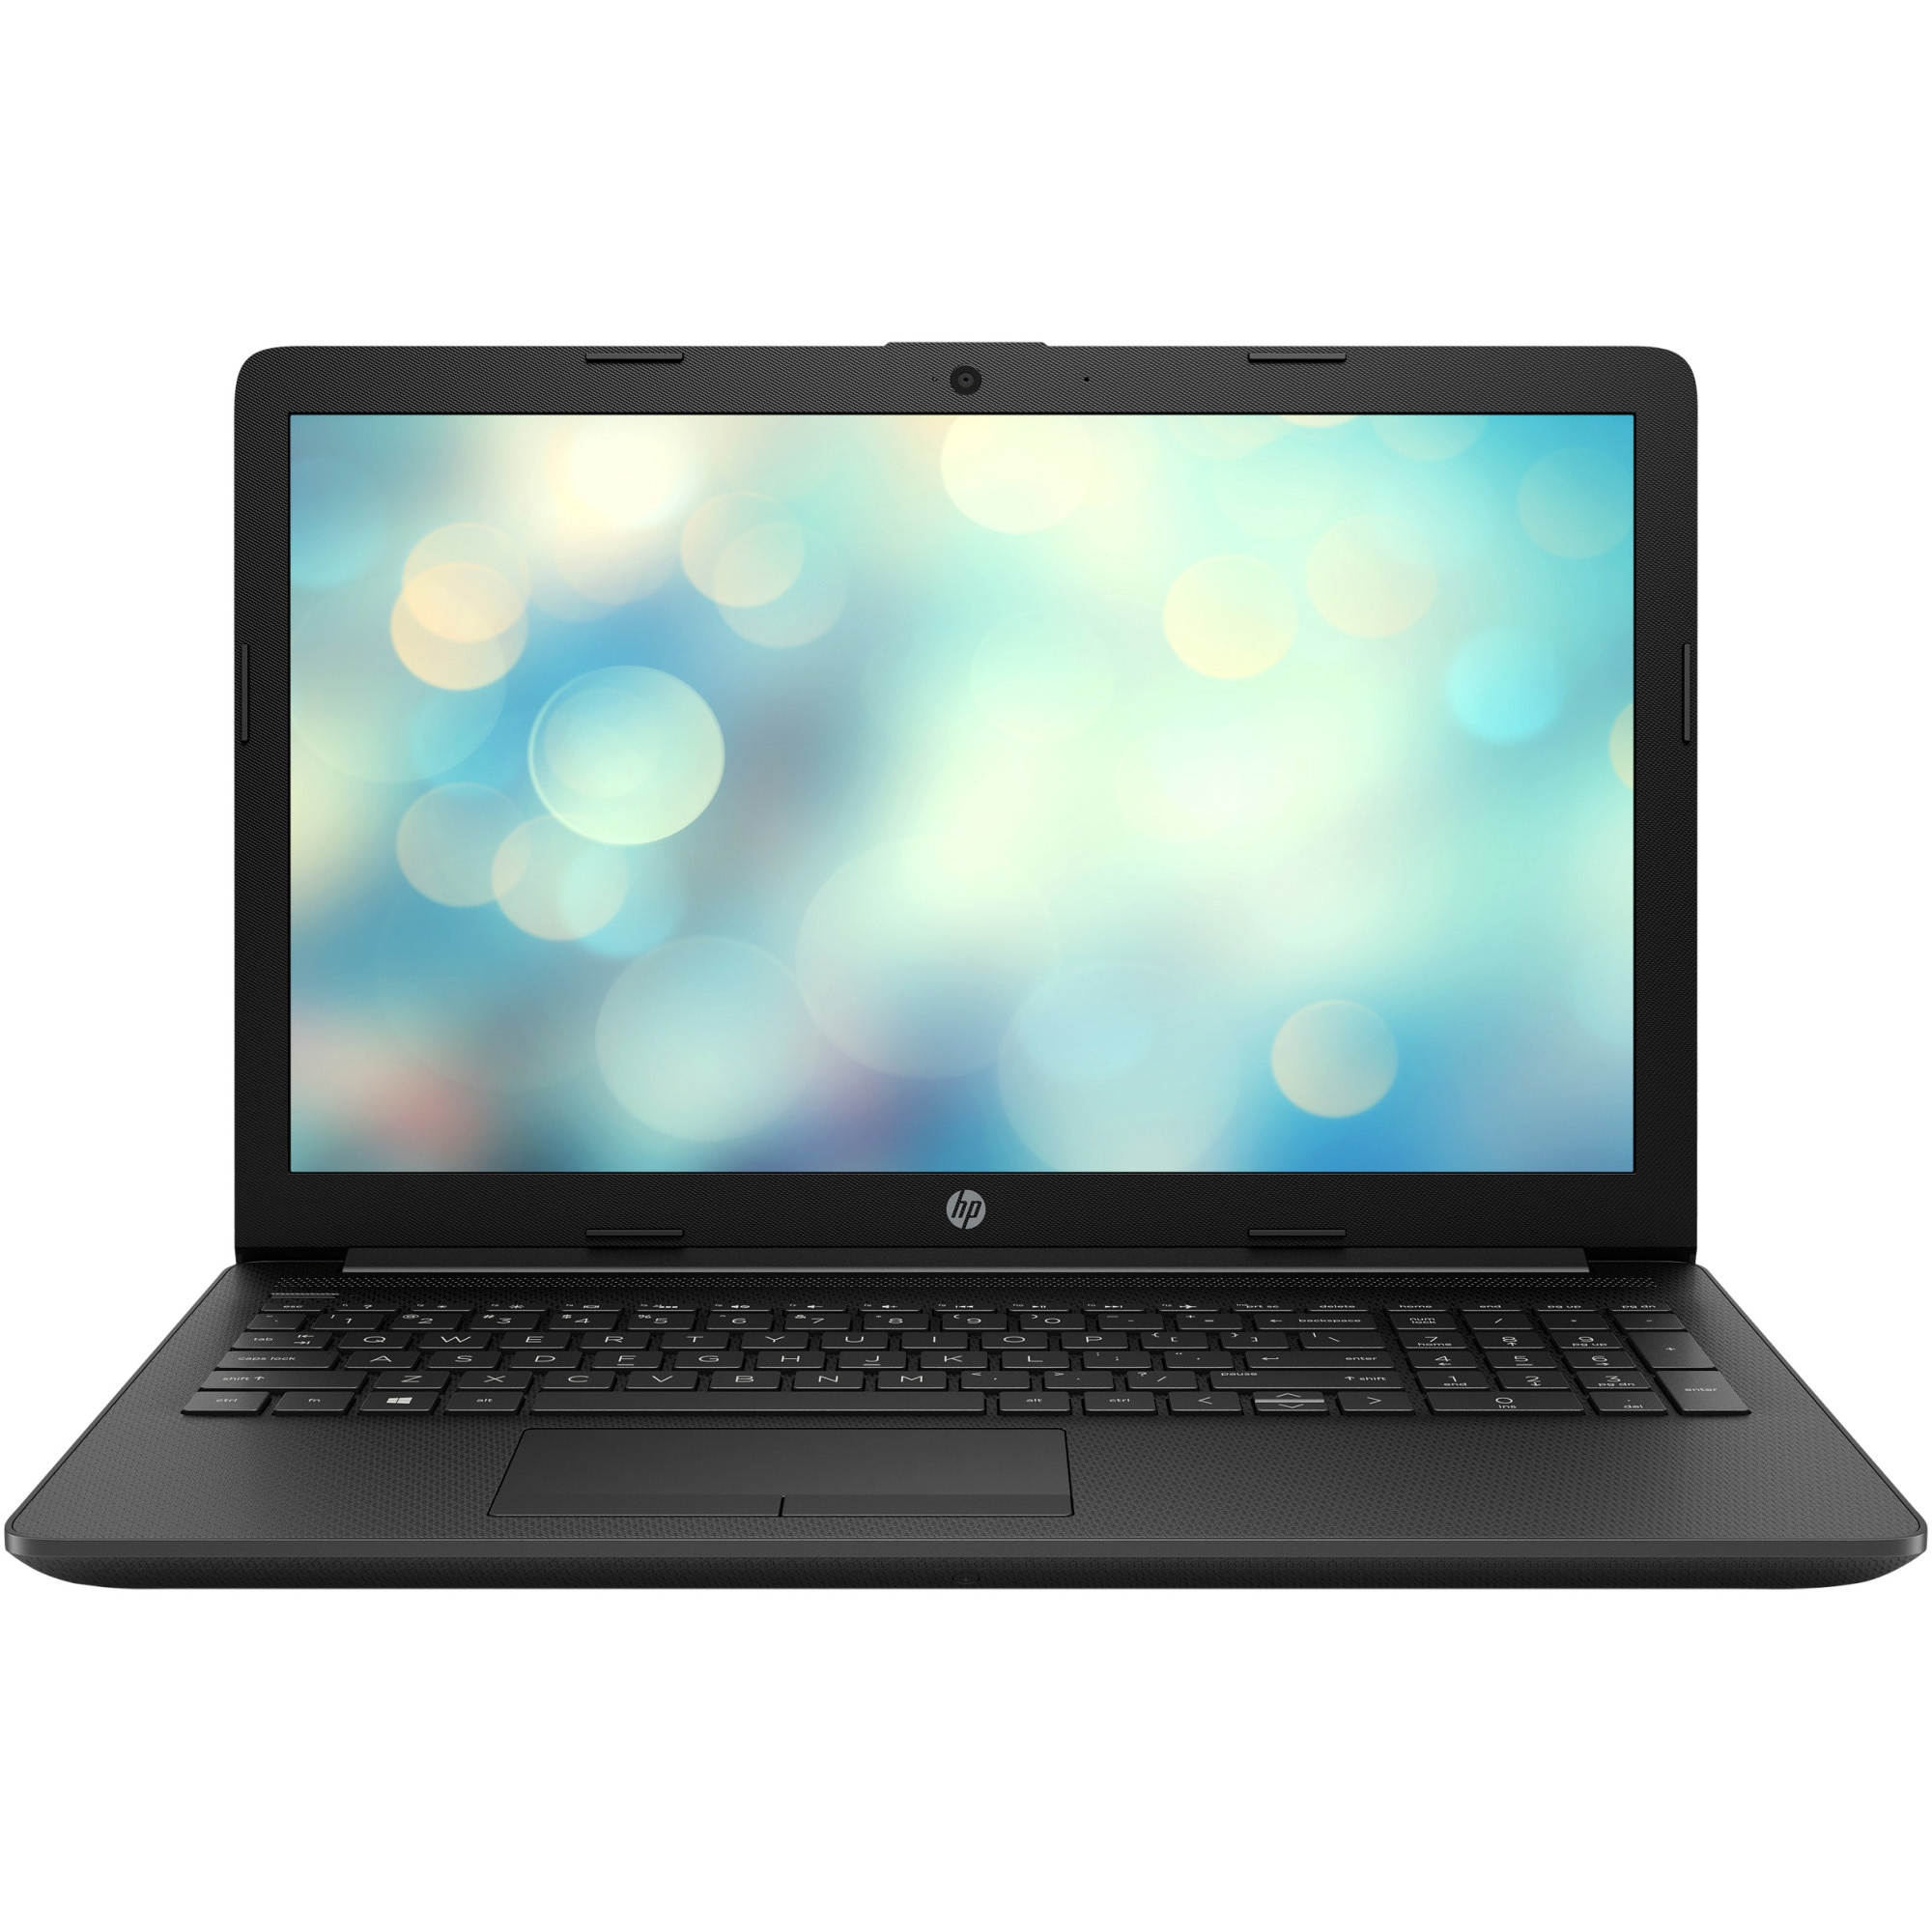 "Fotografie Laptop HP 15-db1200ny cu procesor AMD Ryzen™ 7 3700U pana la 4.00 GHz, 15.6"", Full HD, 8GB, 1TB HDD, DVD-RW Radeon™ Vega 10, Free DOS, Black"